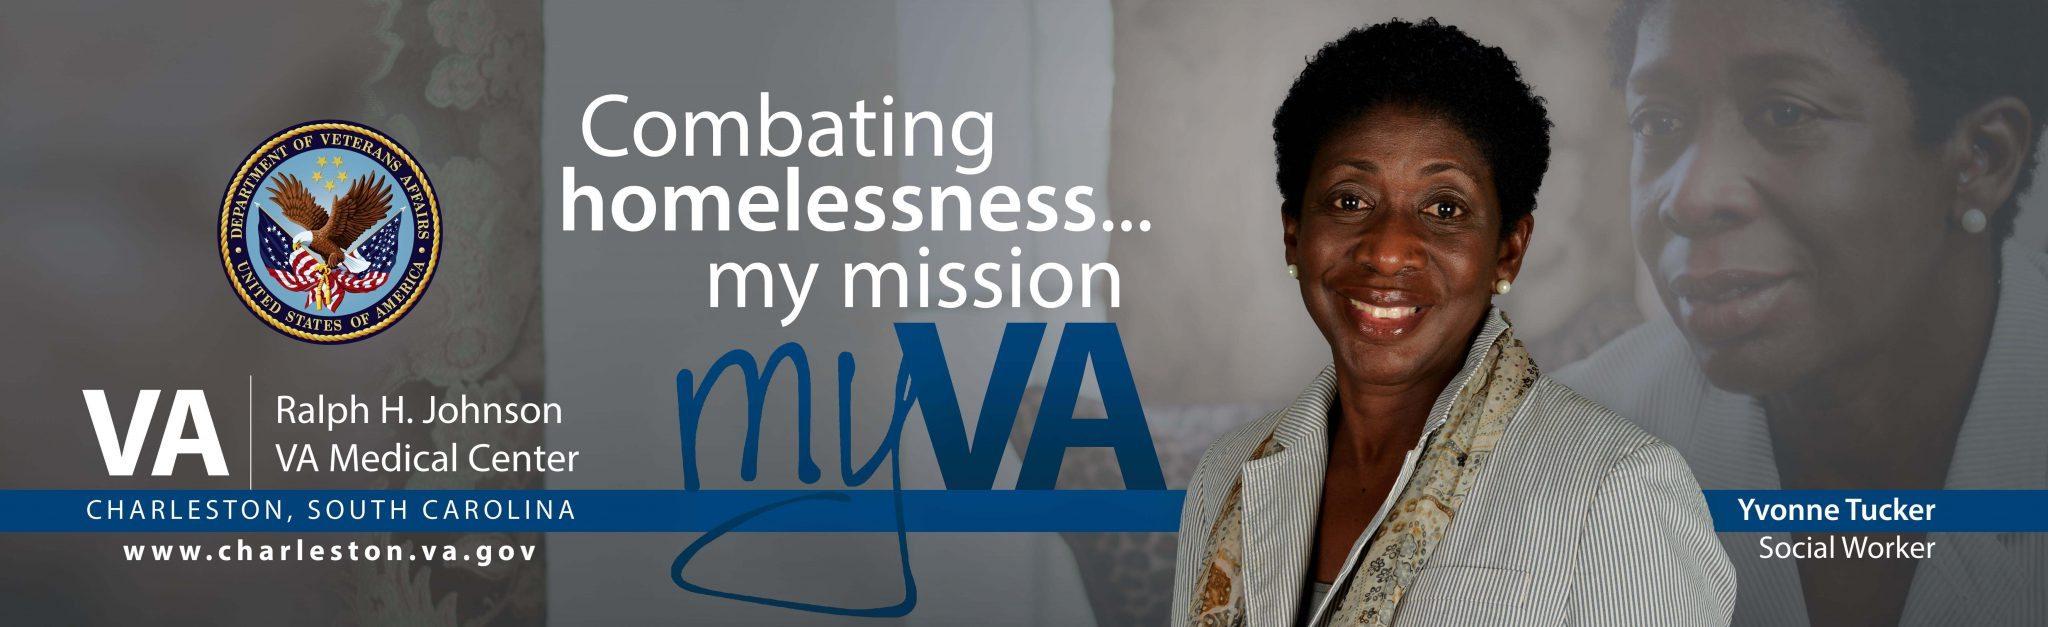 Yvonne Tucker, Homeless Care Team Social Worker billboard